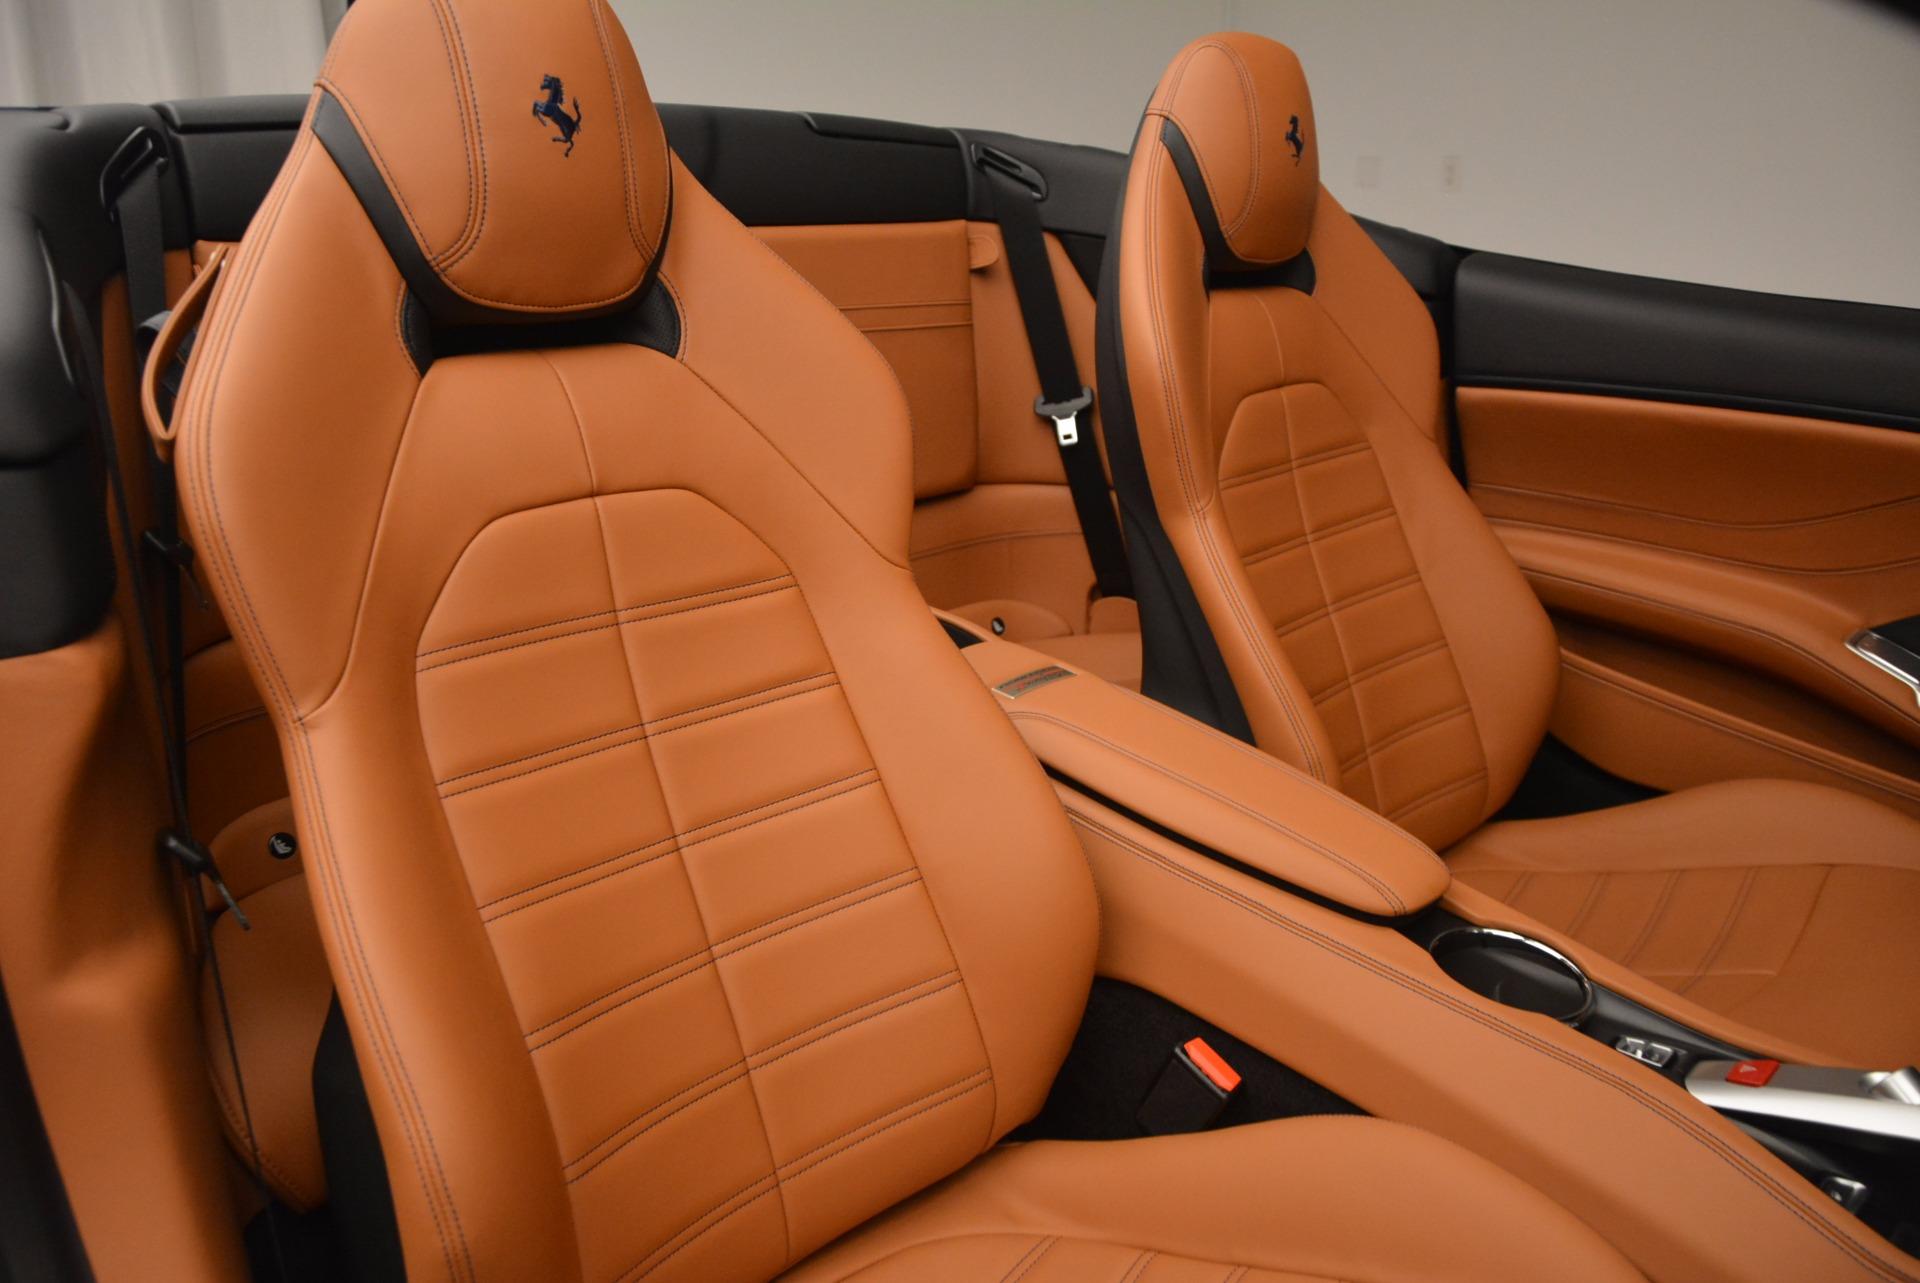 Used 2017 Ferrari California T Handling Speciale For Sale In Greenwich, CT. Alfa Romeo of Greenwich, F1809B 1394_p32